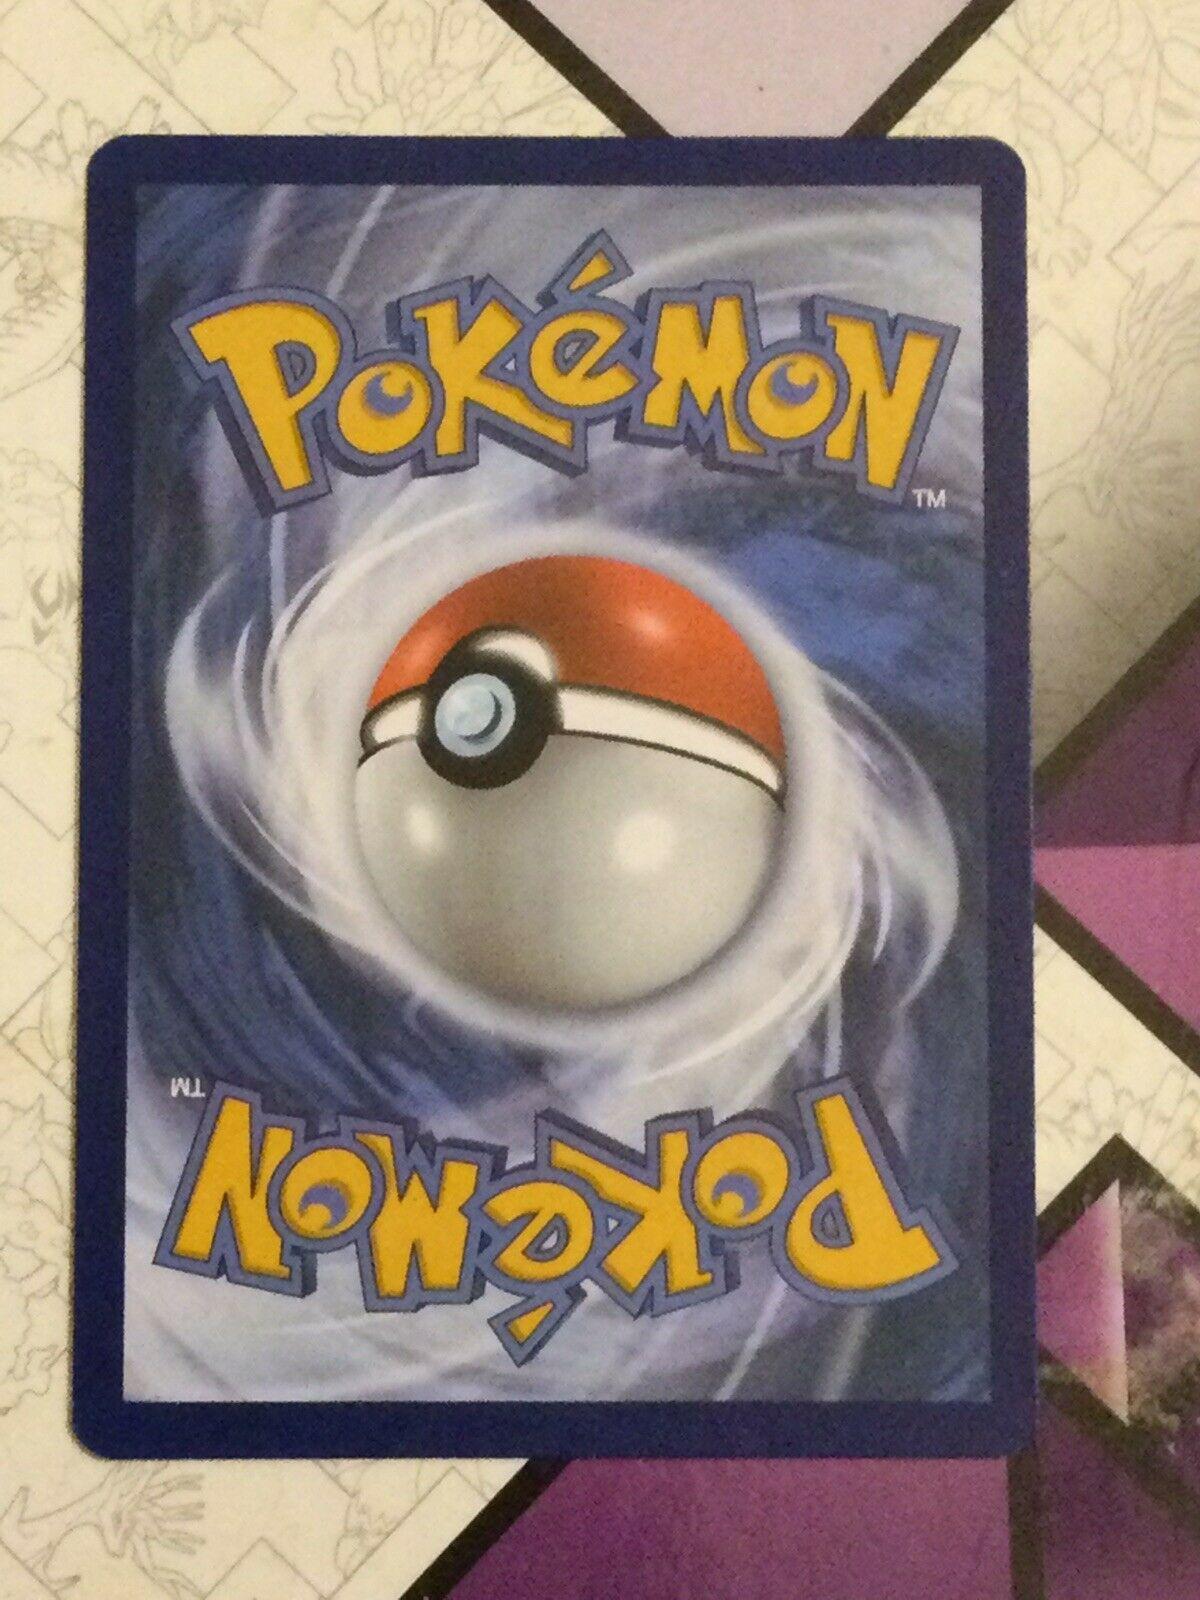 Pokemon - Larvesta 023/198 - Reverse Holo - Chilling Reign - NM/M - Image 3